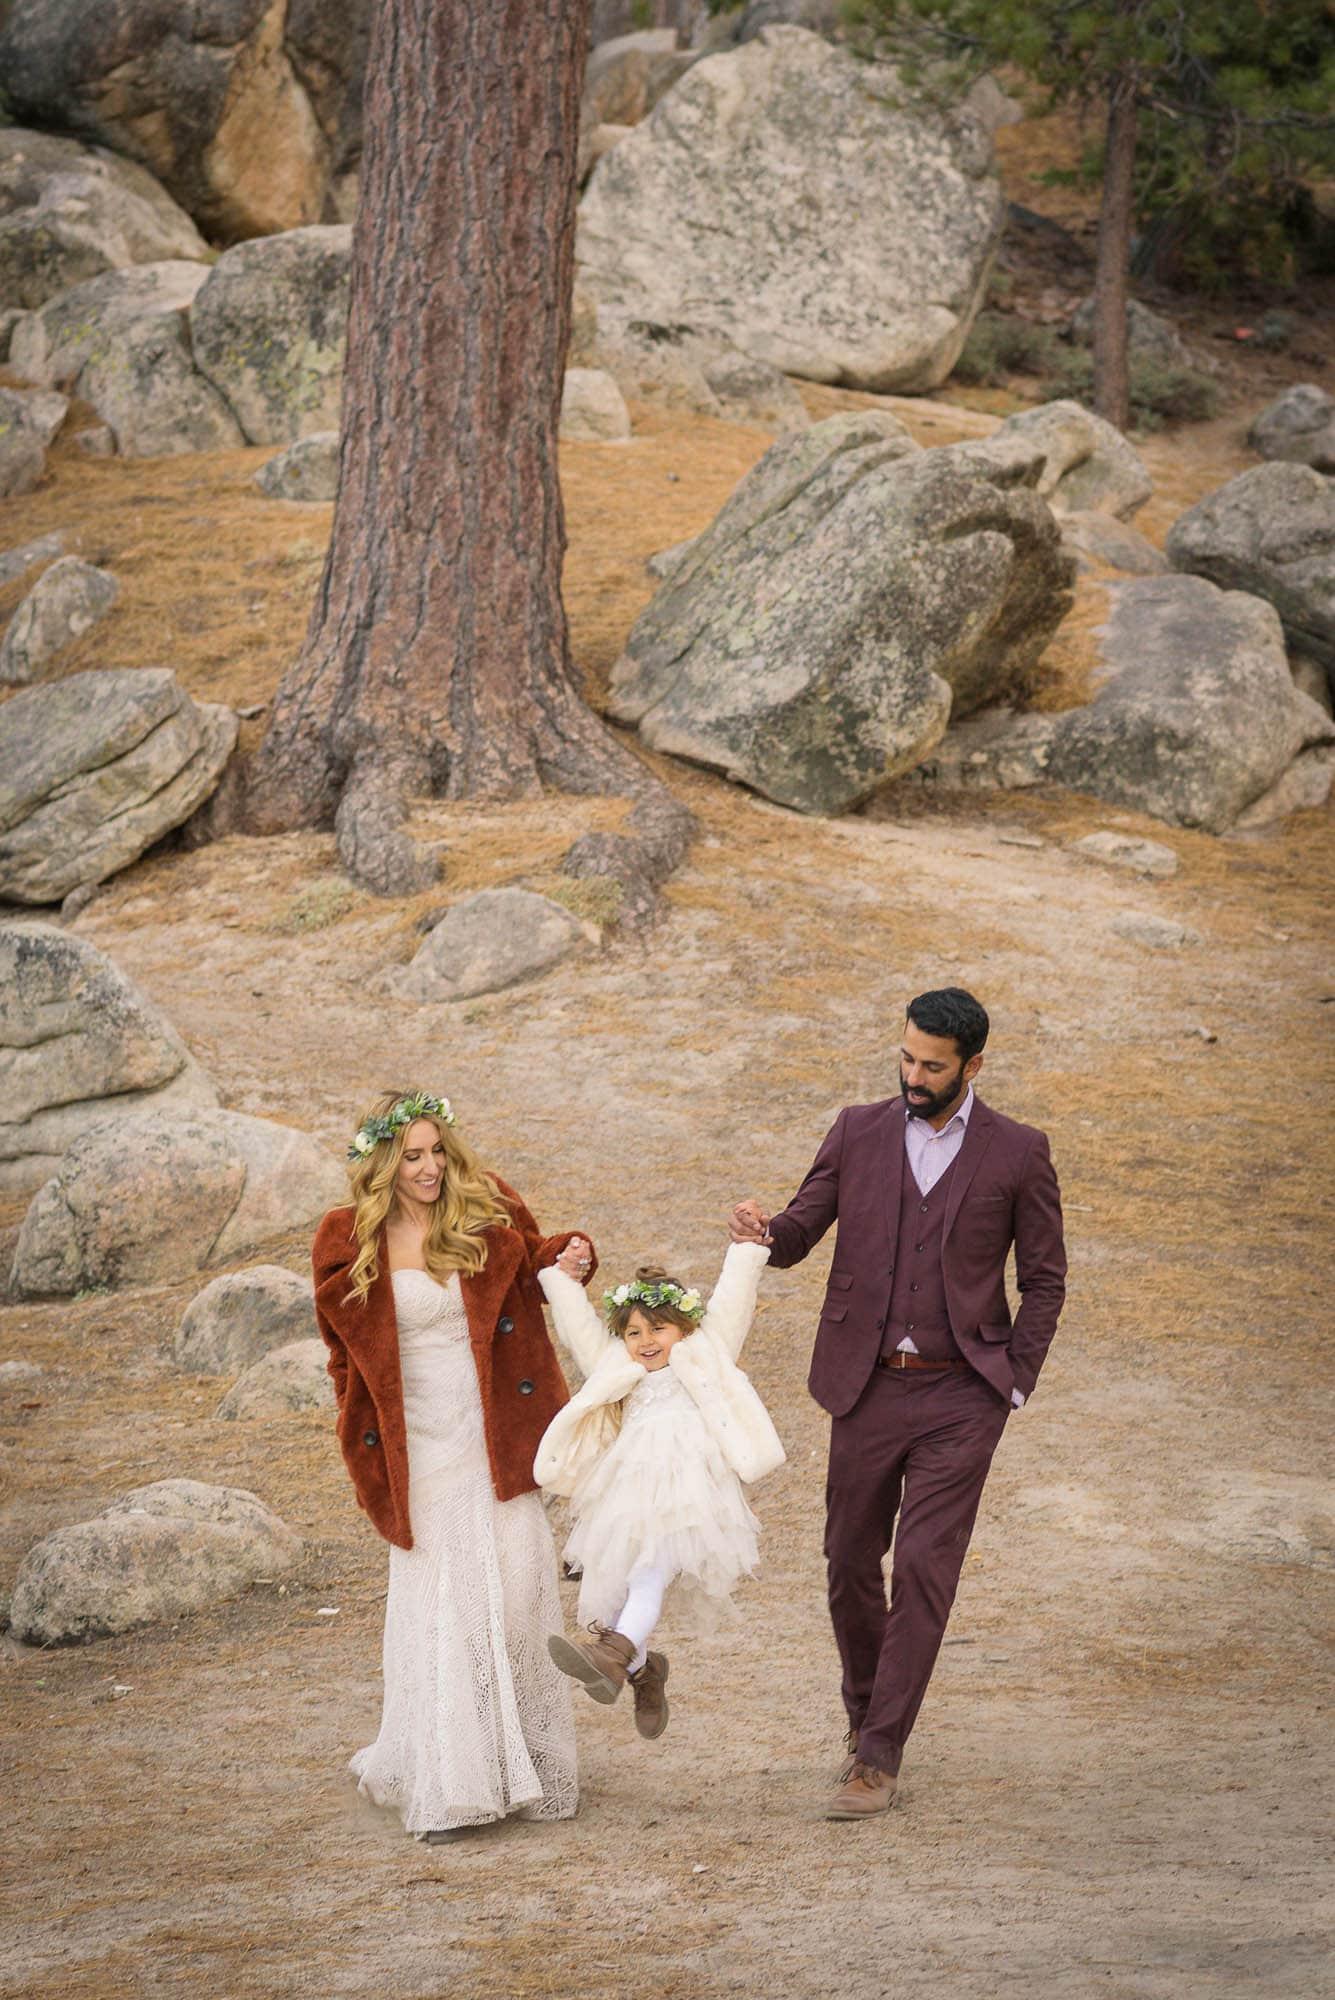 043_Alan_and_Heidi_Wedding_Natalie_Mike